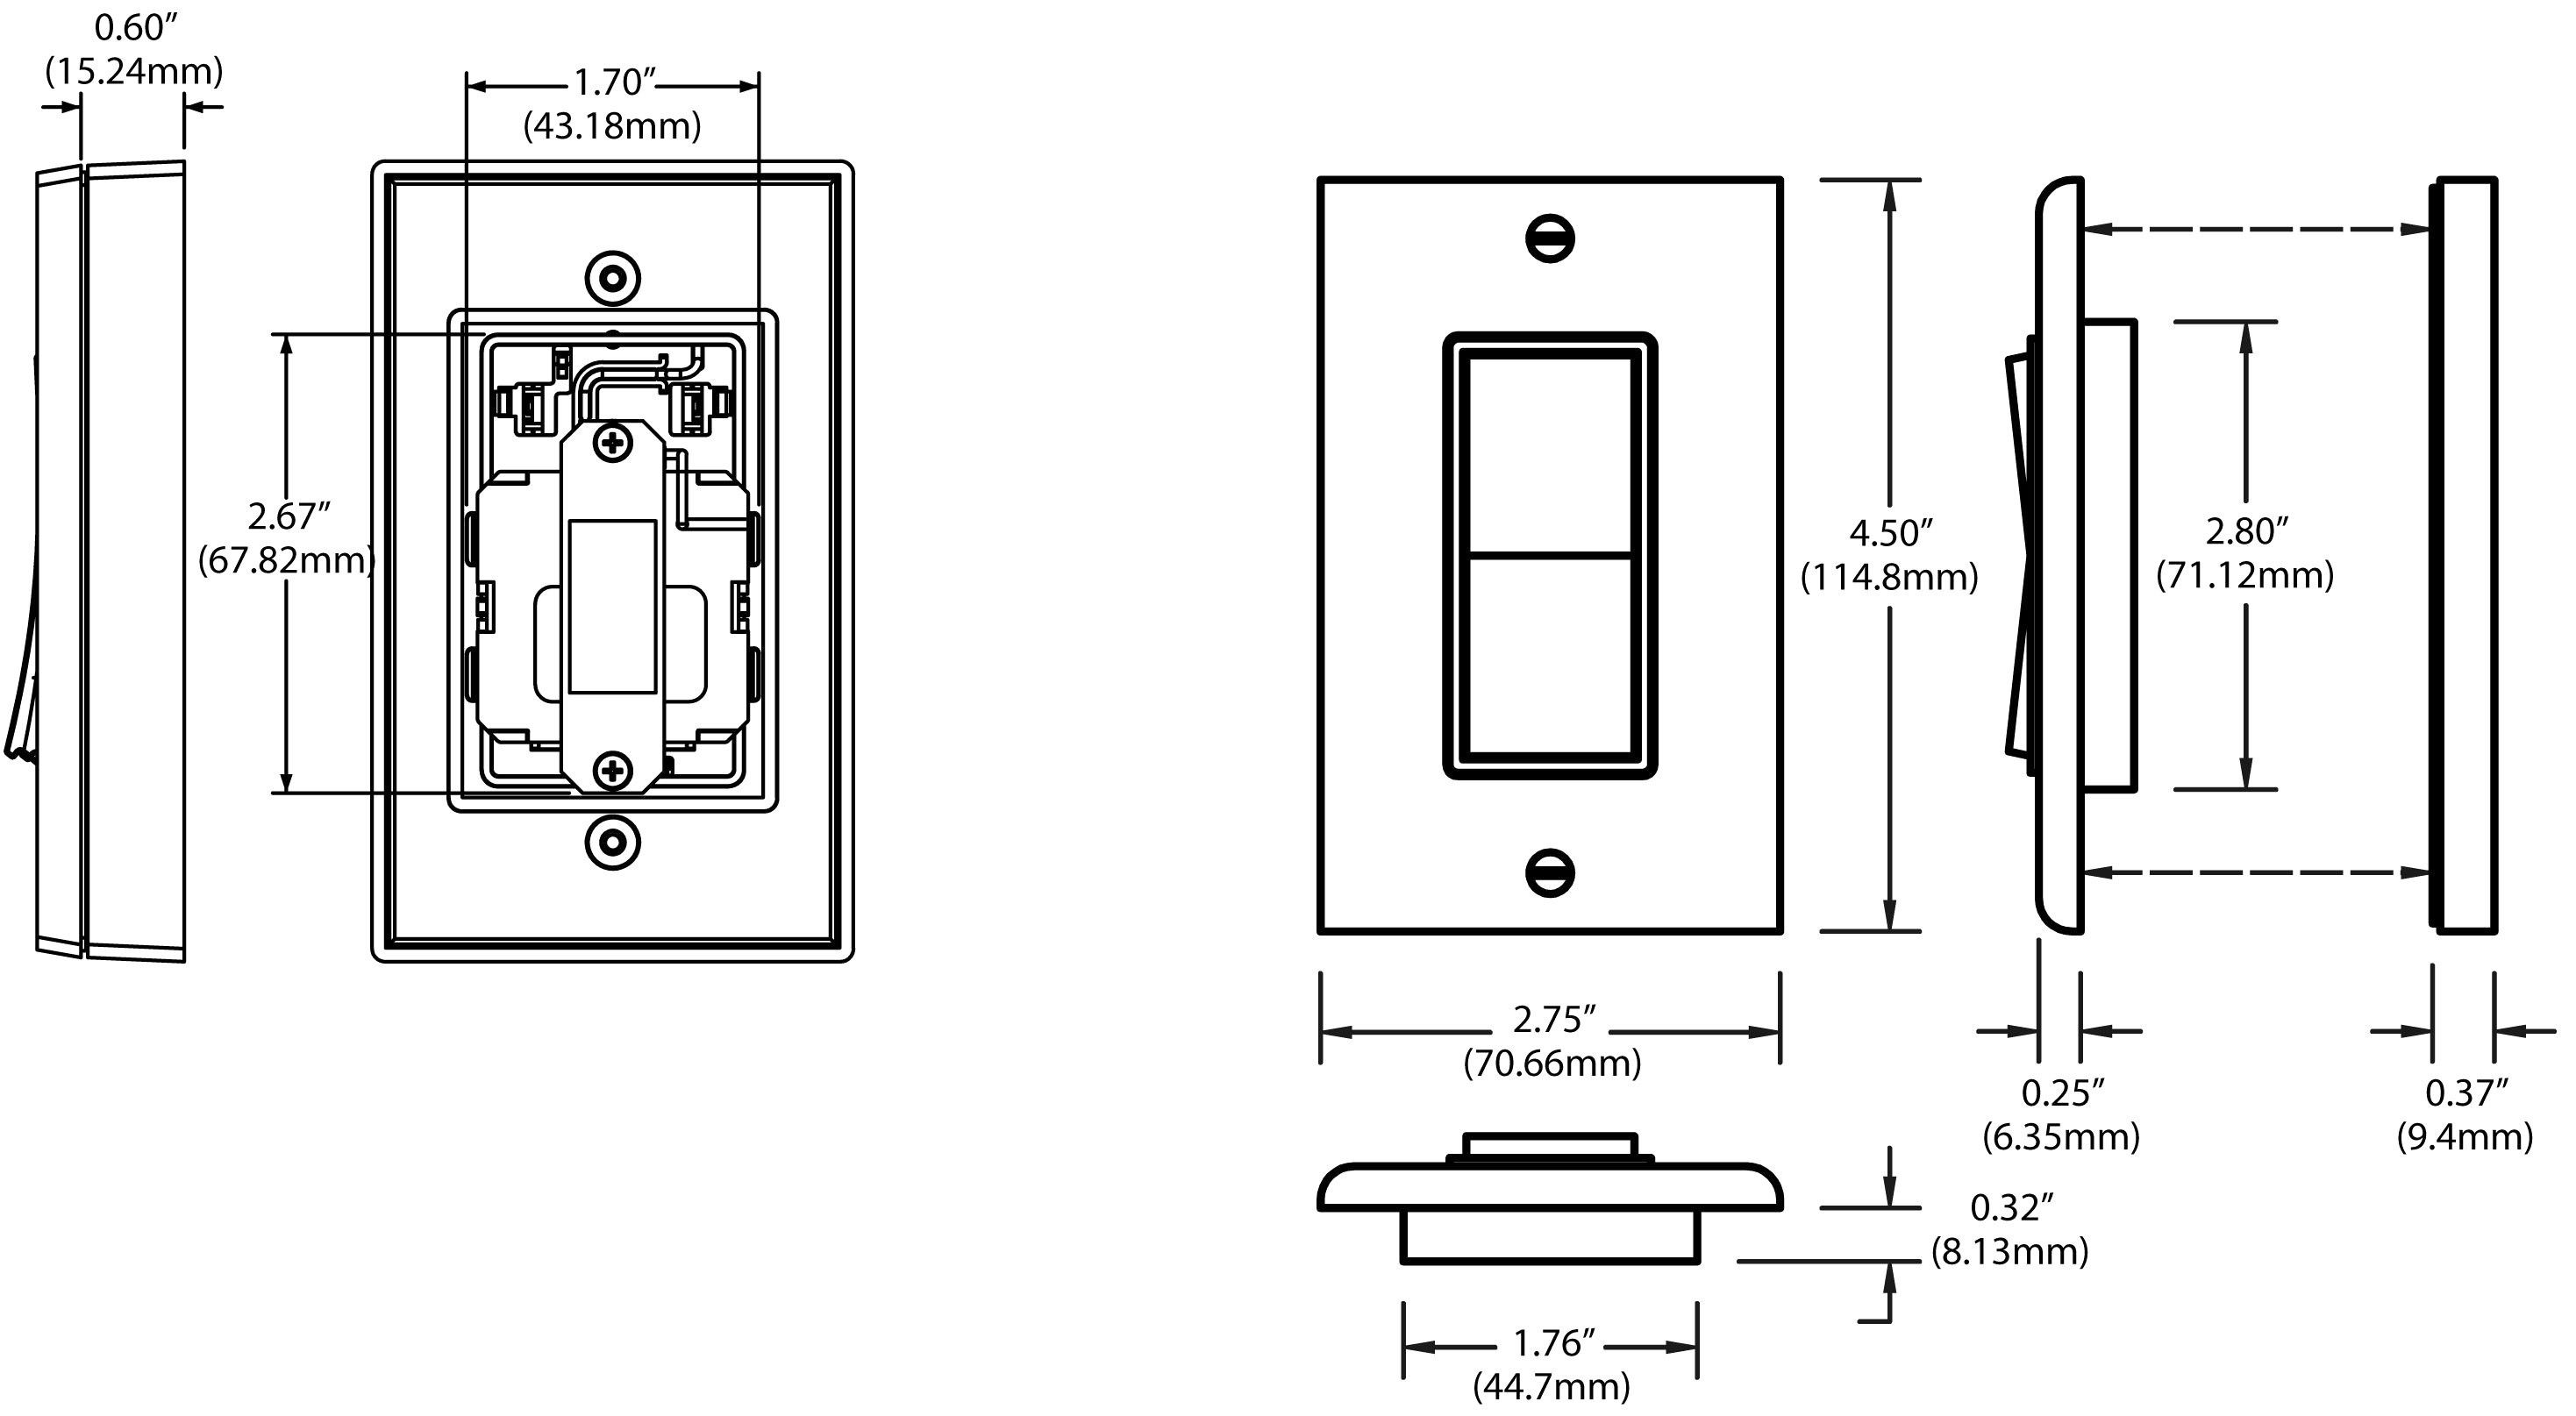 medium resolution of beautiful leviton light switch wiring diagram diagrams digramssample diagramimages wiringdiagramsample wiringdiagram